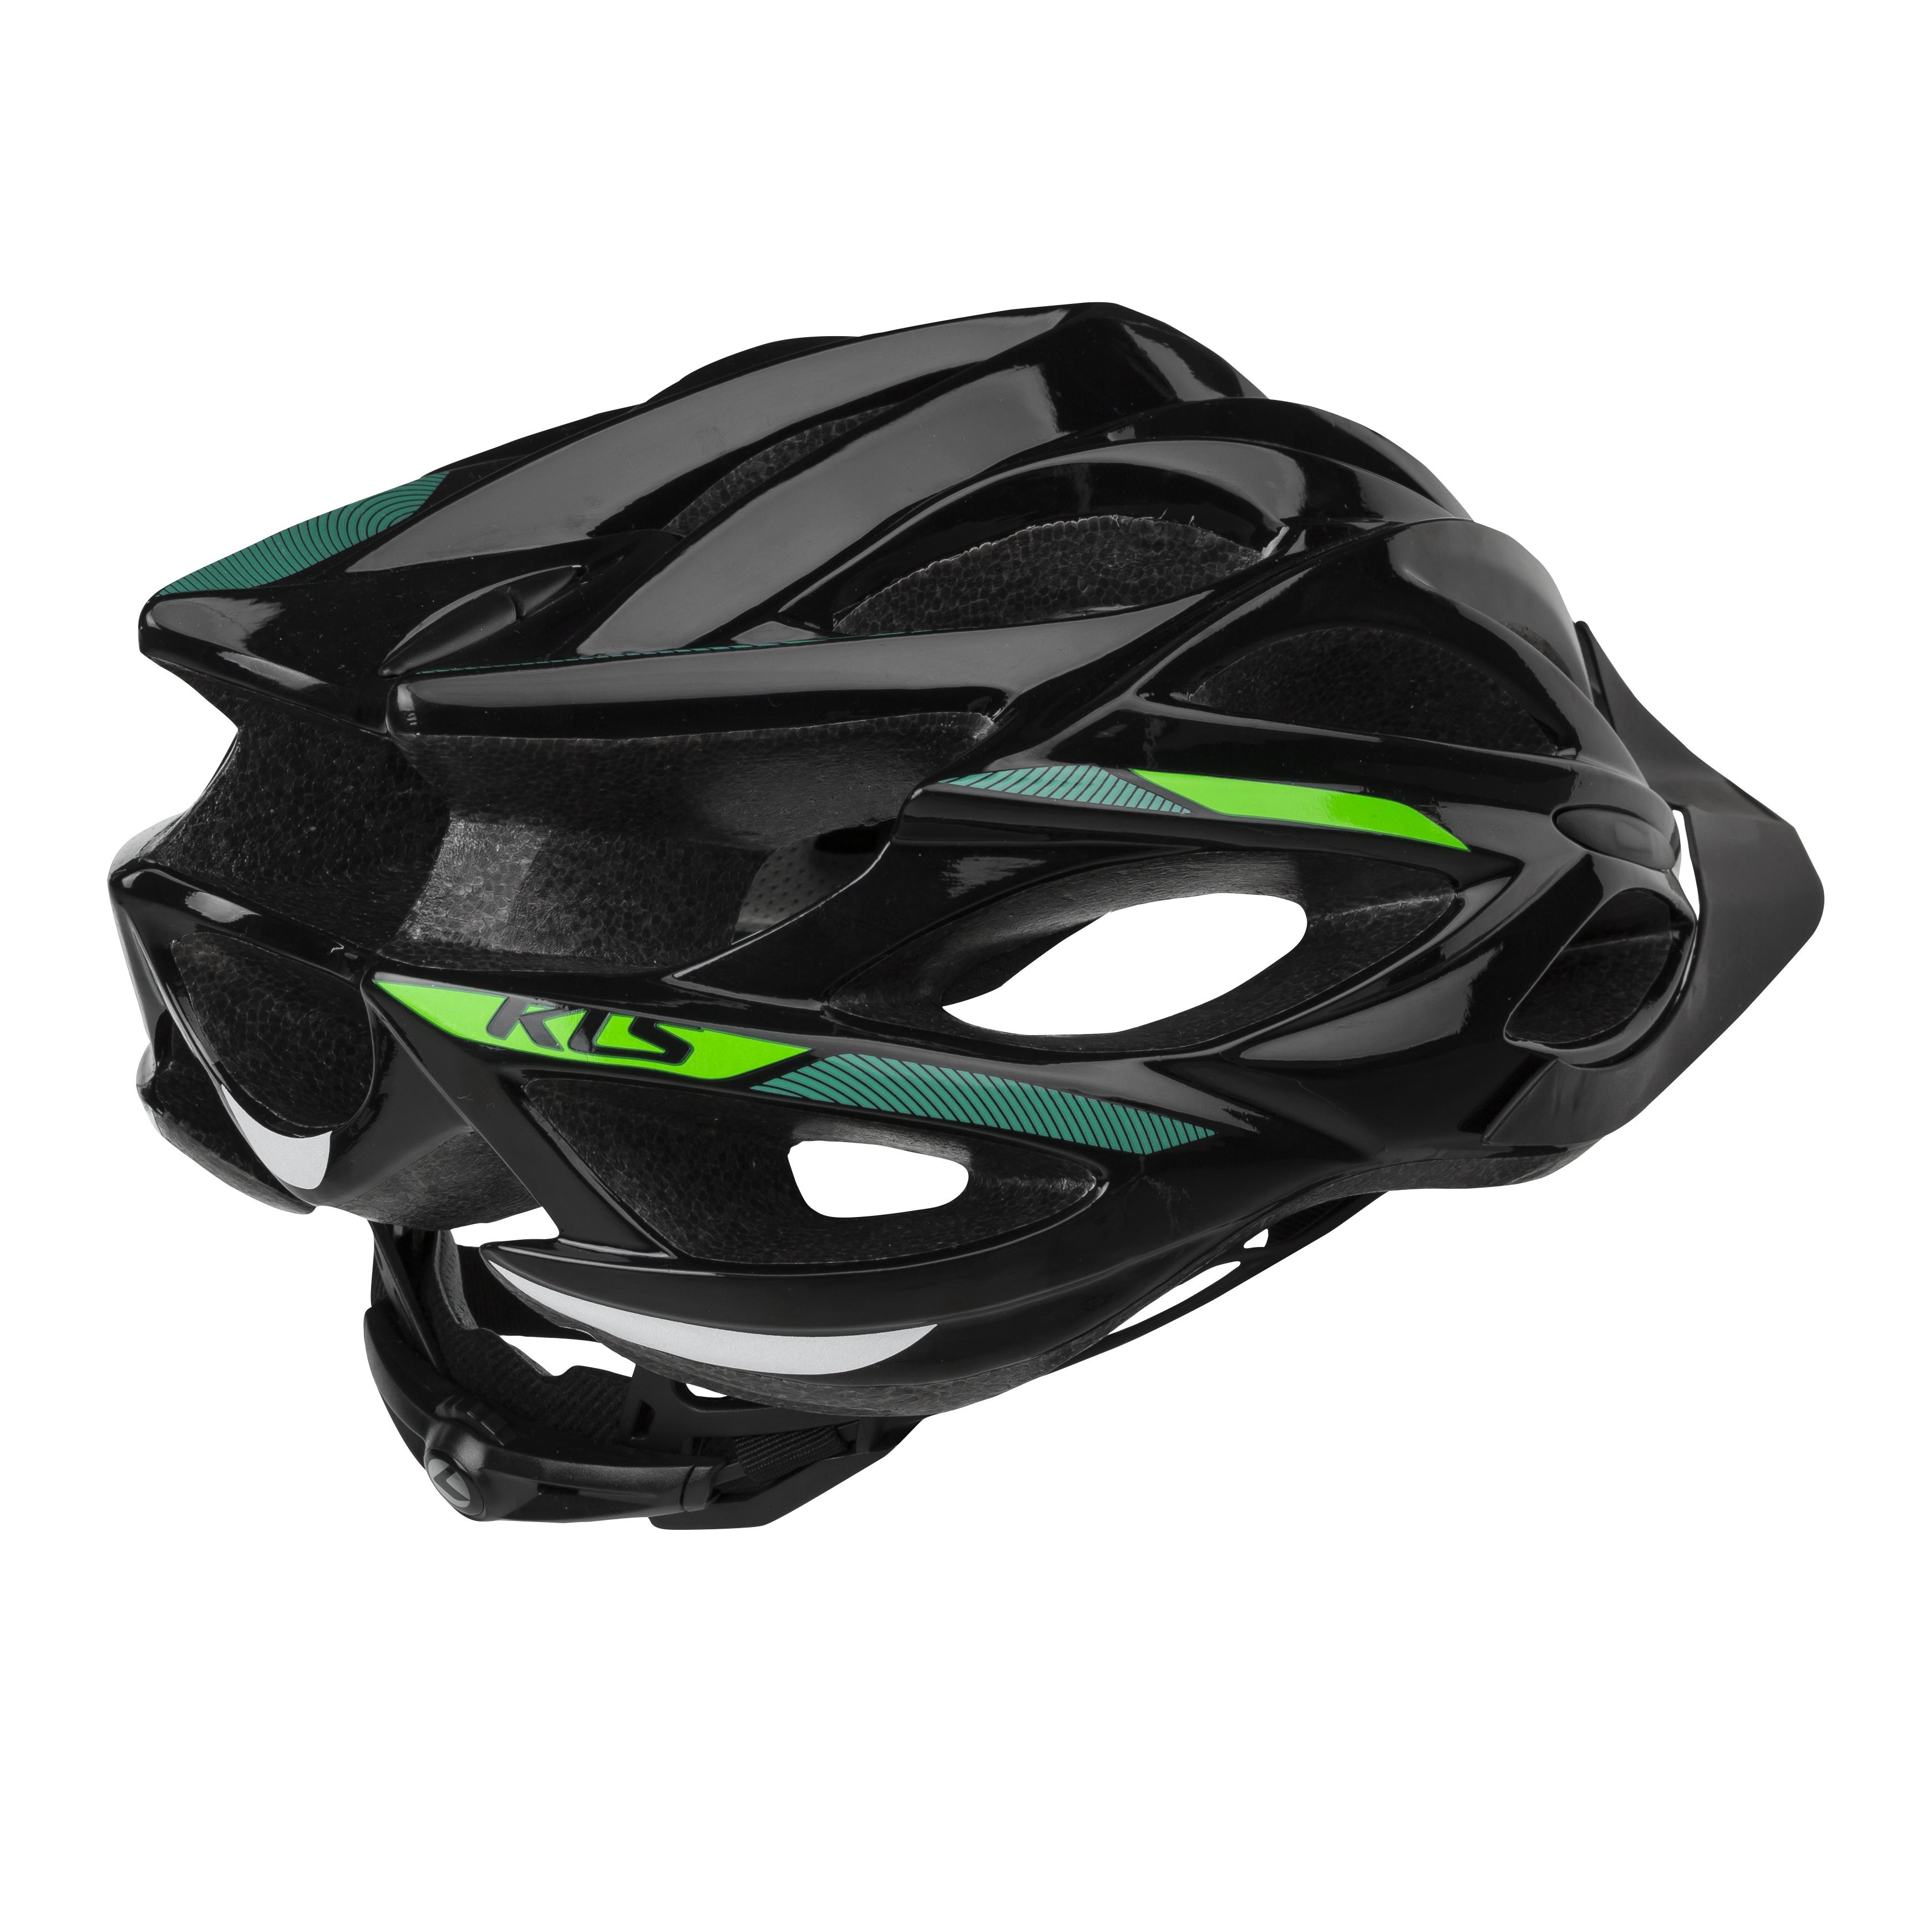 kask rowerowy kellys dynamic black green bck